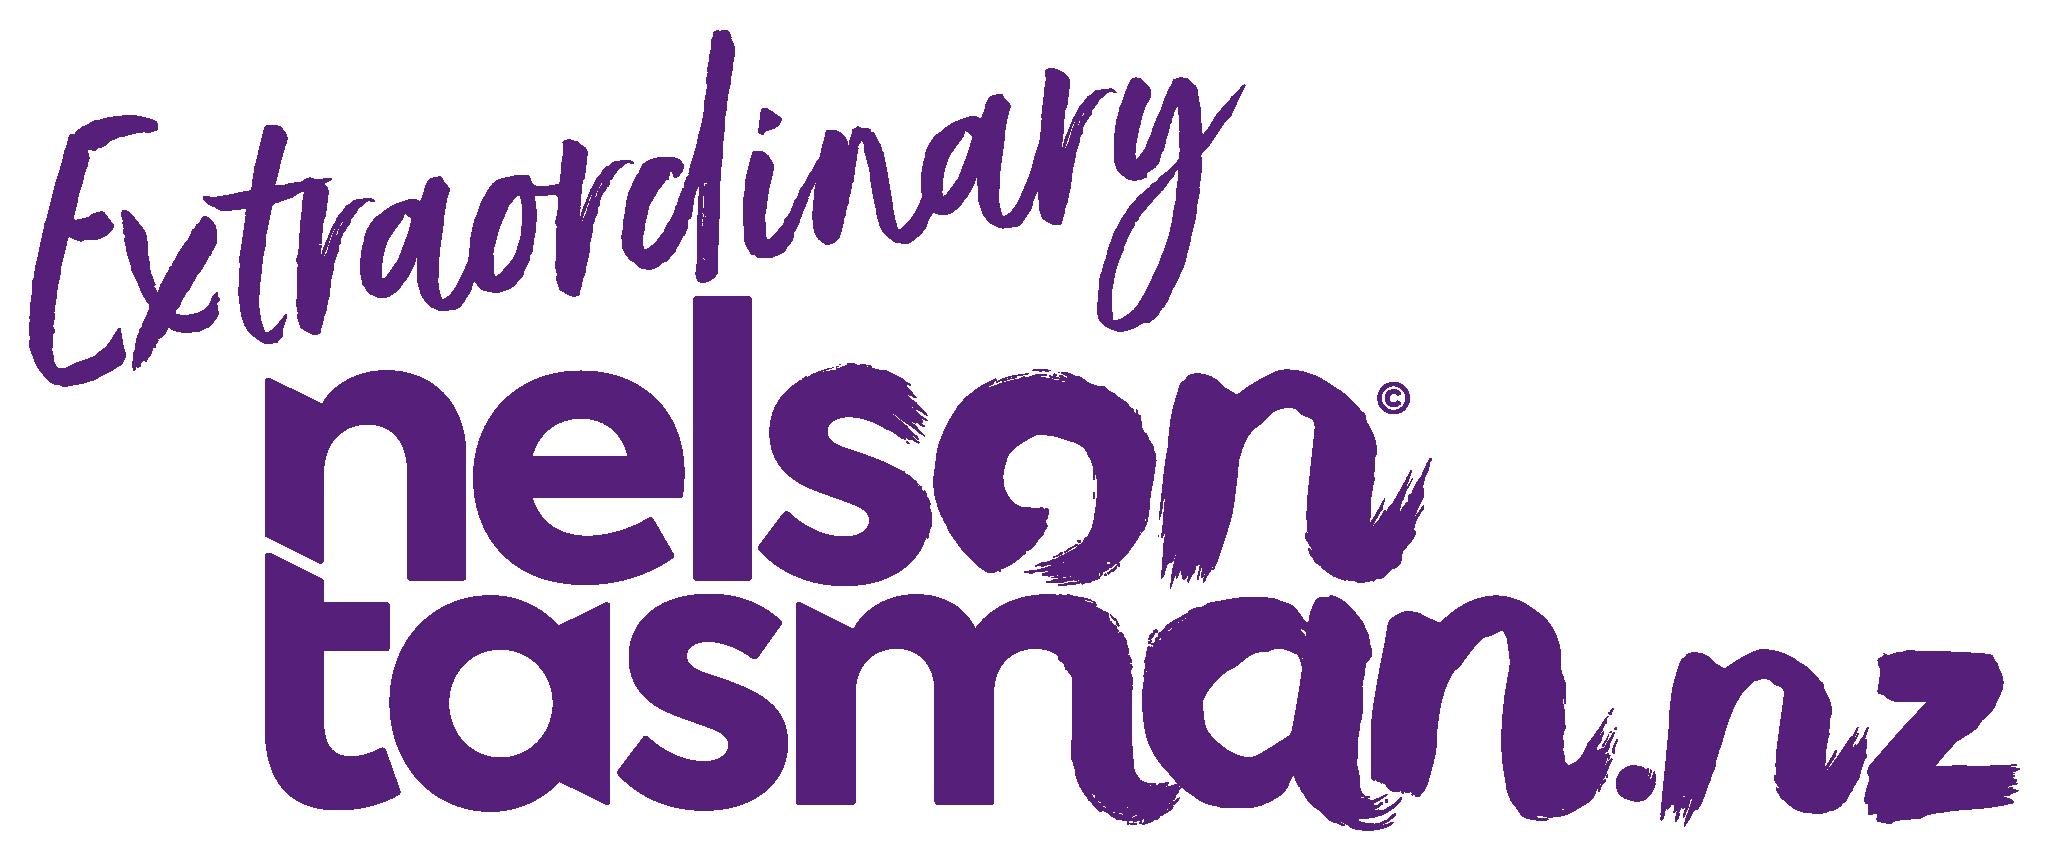 Nelson Tasman extraordinary - nelson tasman boysenberry copy.png